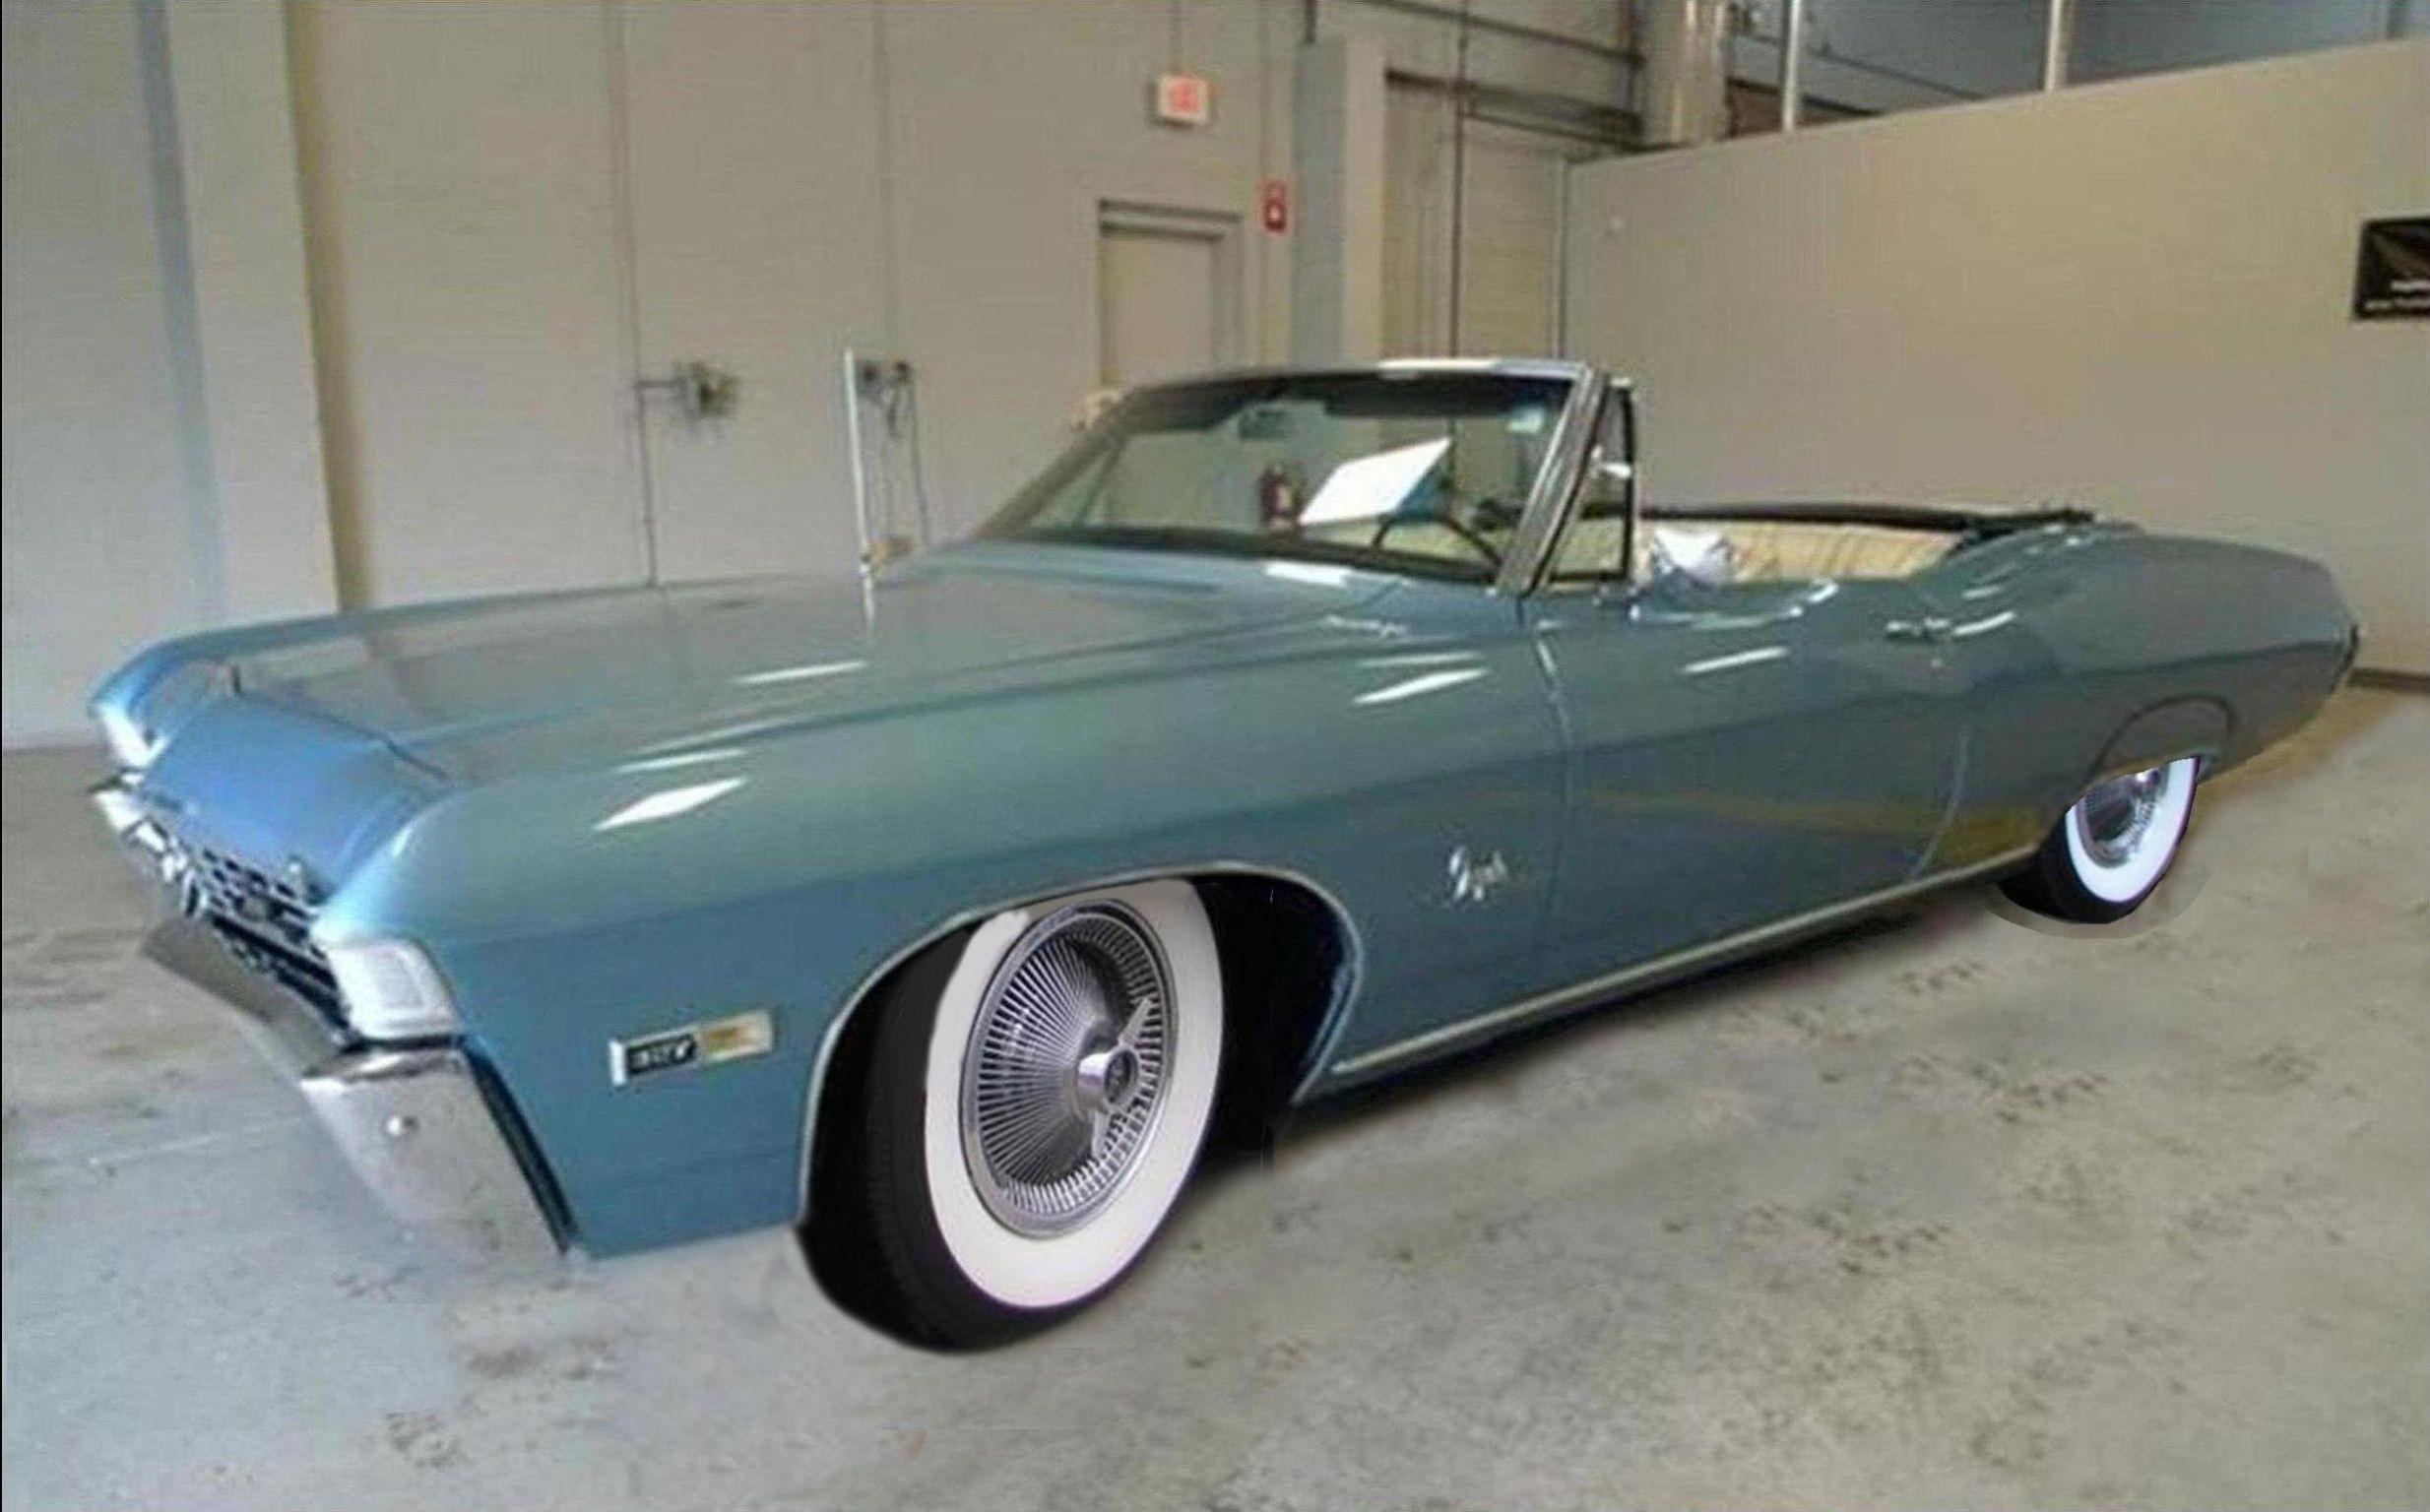 68 Impala 1968 Impala Convertible Lowrider Custom Impala Impala Chevy Impala Chevrolet Impala